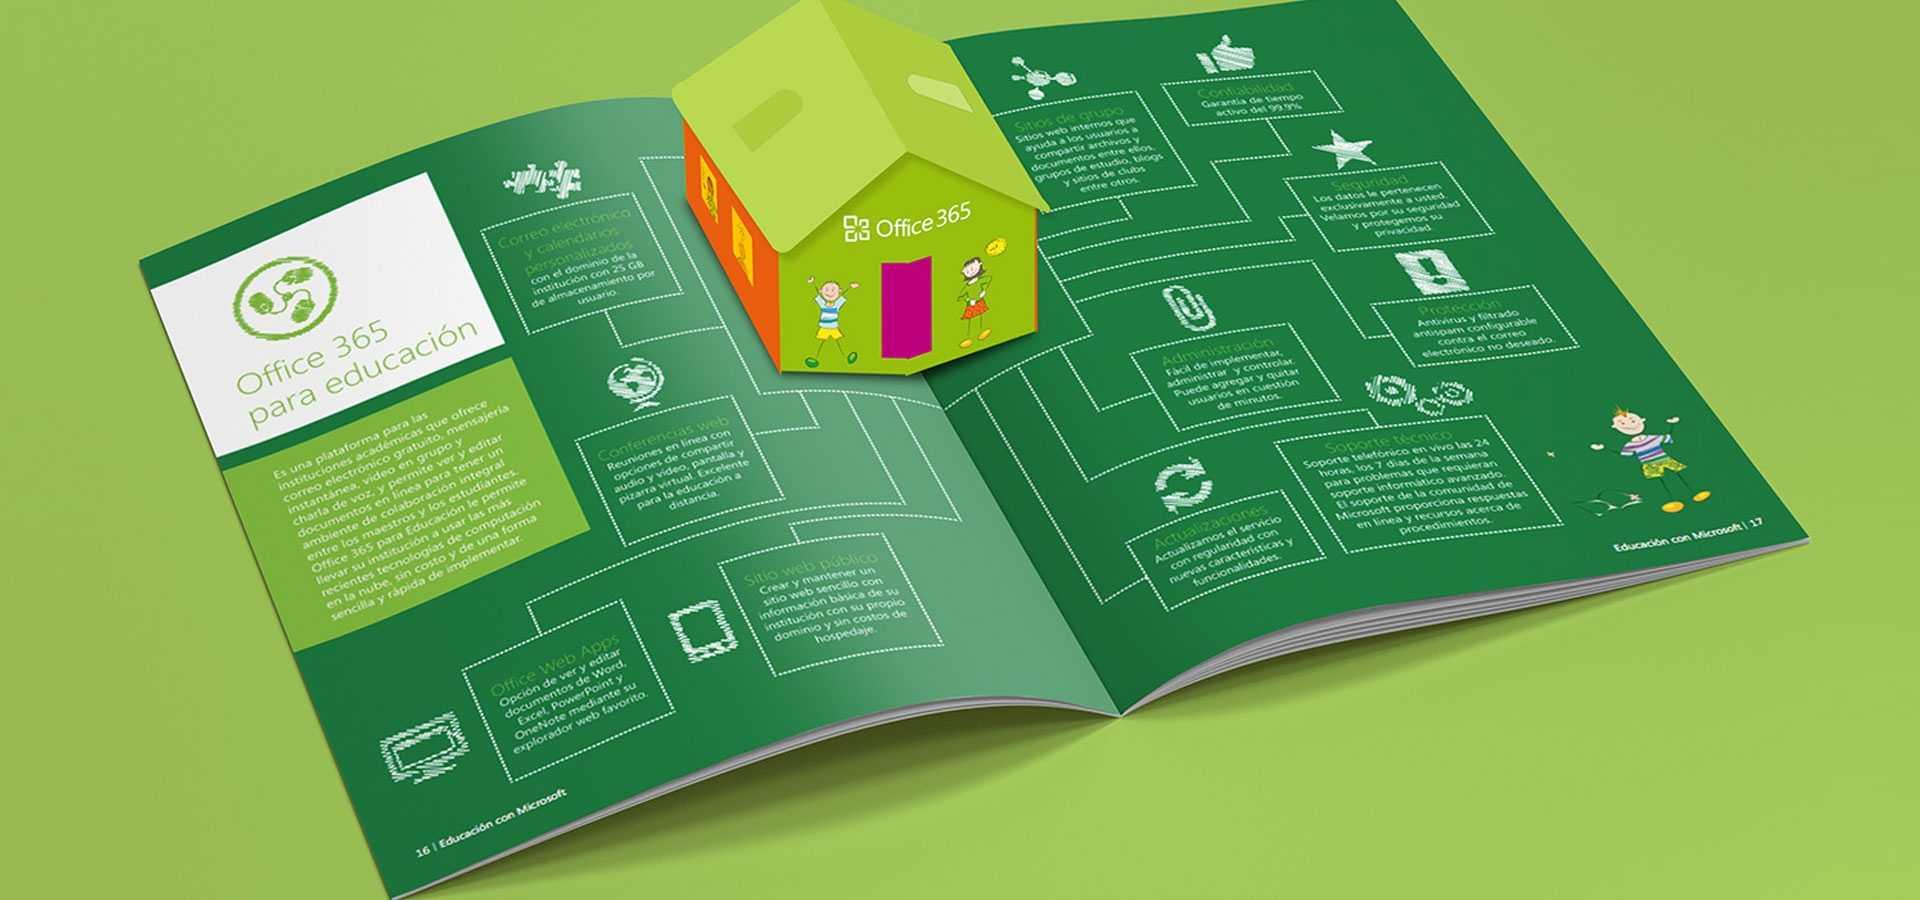 19+ 3D Pop Up Brochure Designs   Free & Premium Templates With Regard To Pop Up Brochure Template